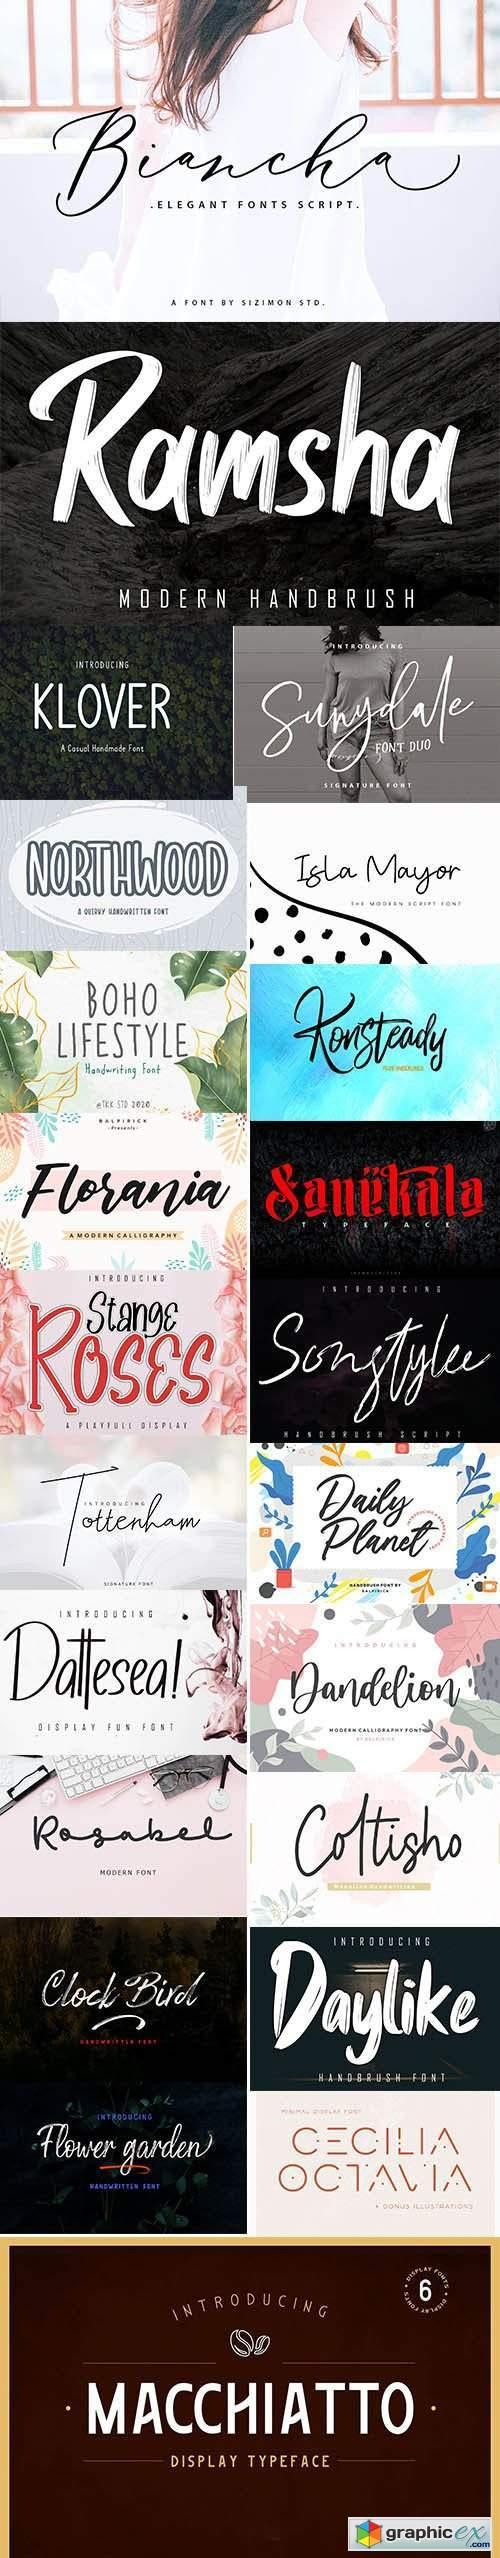 Creative Fonts Pack [June-2020] - 23 Fonts